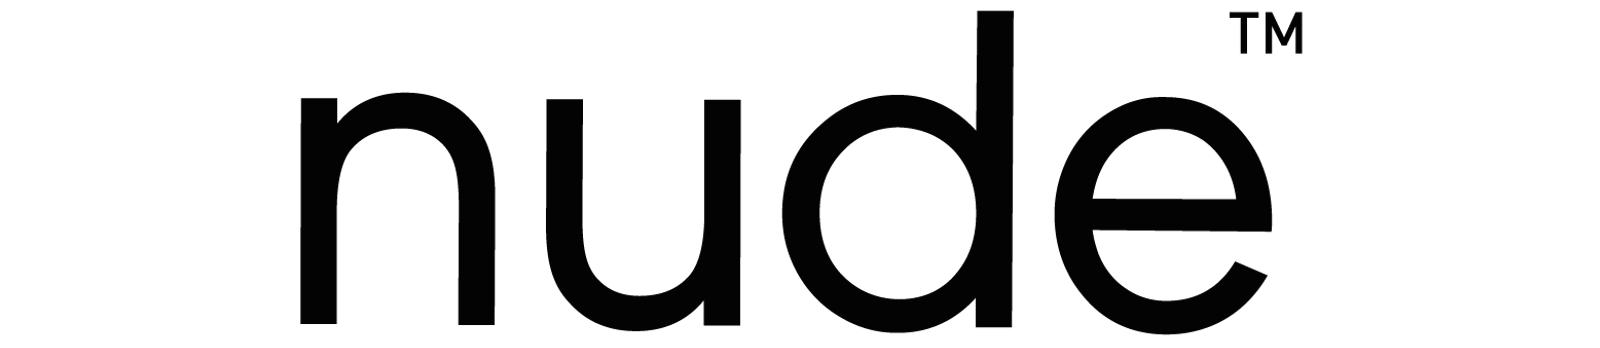 Event Sponsor - Nude Vodka - Logo